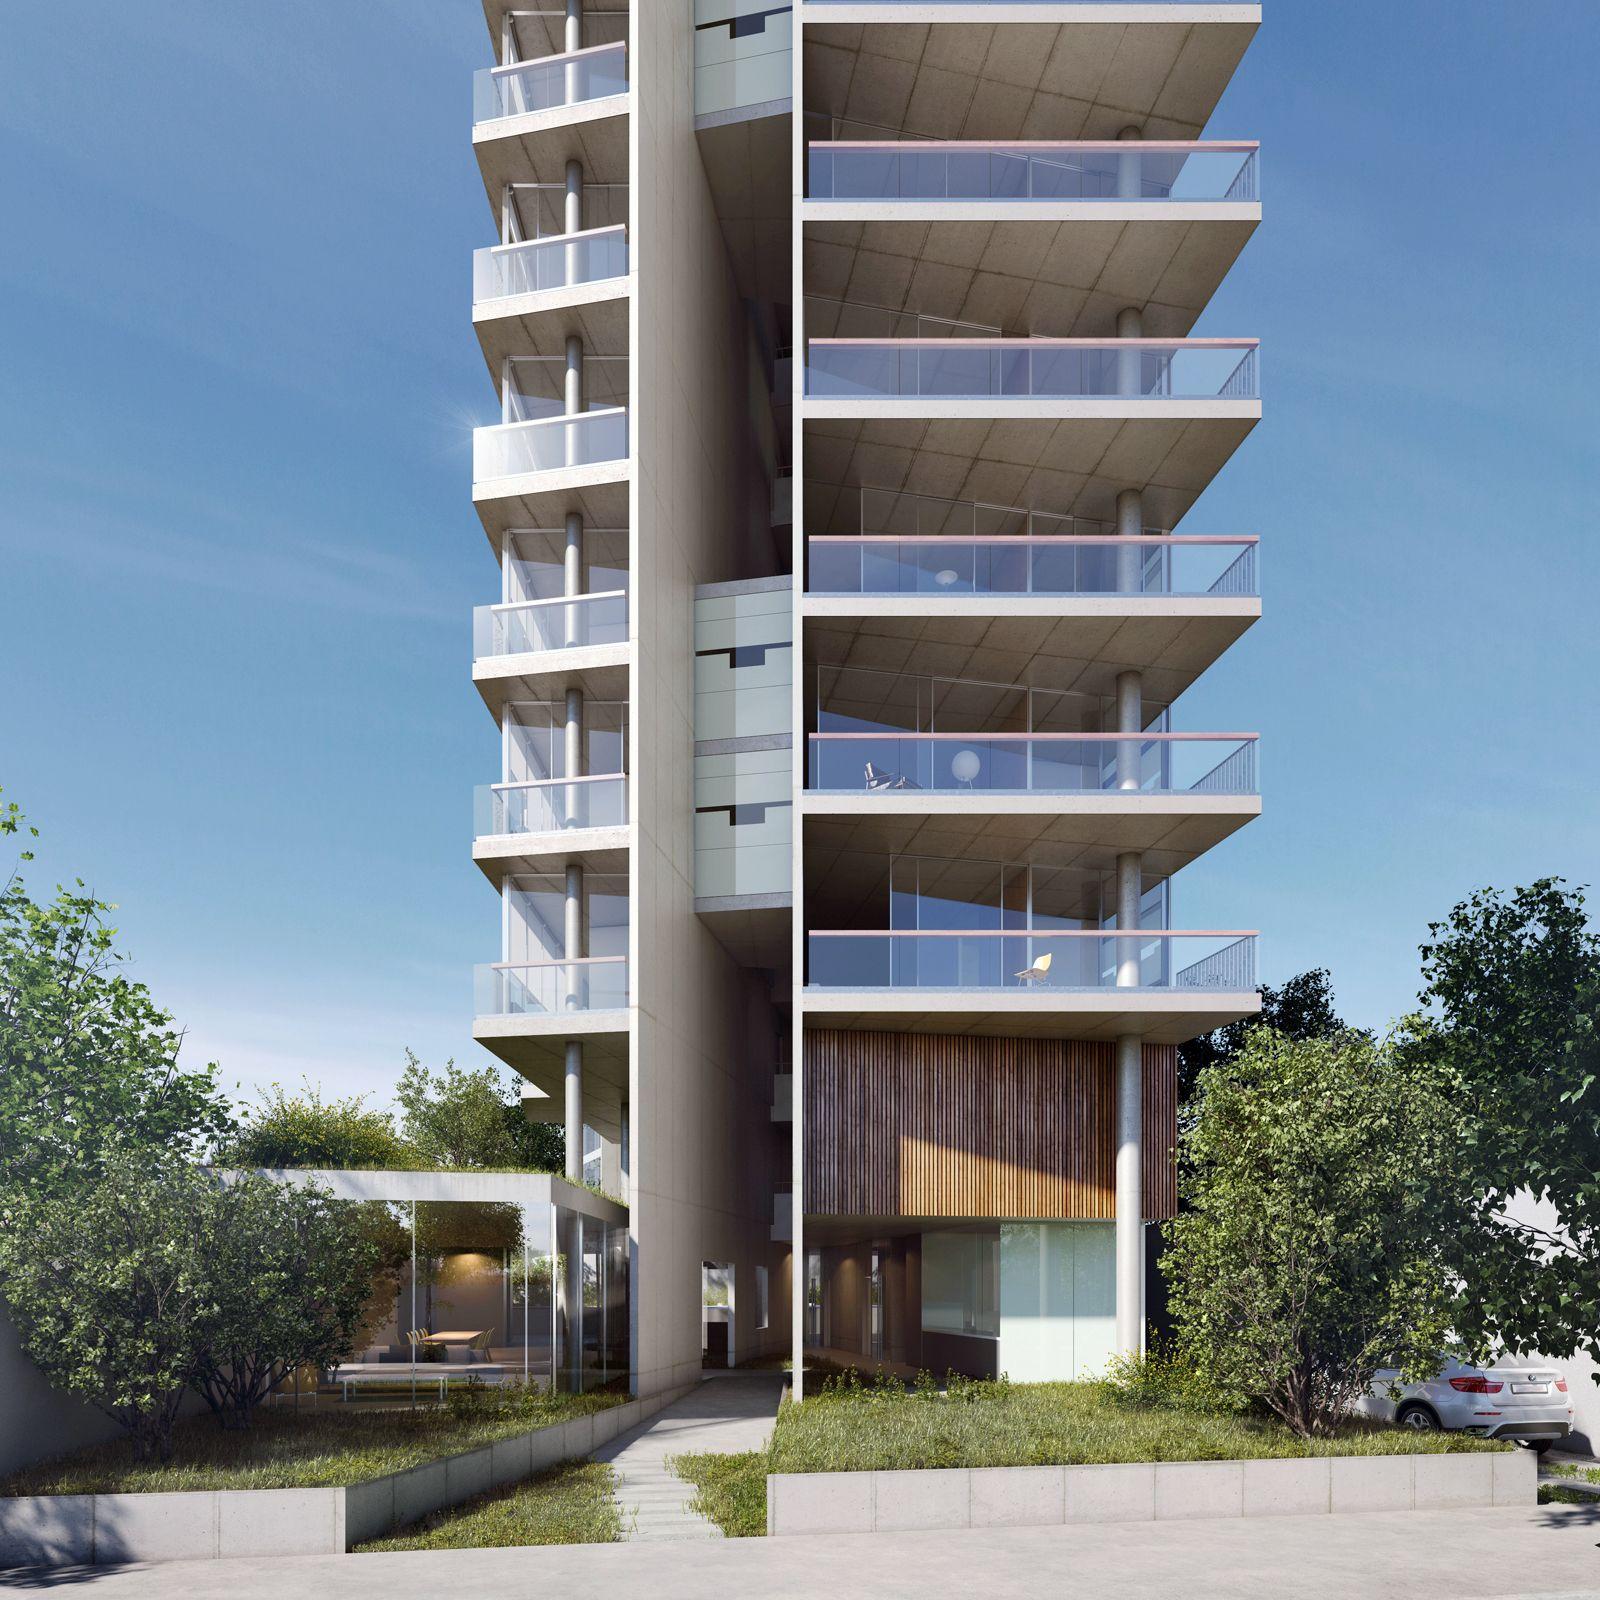 jfl building | sp brazil architecturespbr arquitetos renderingsricardo canton